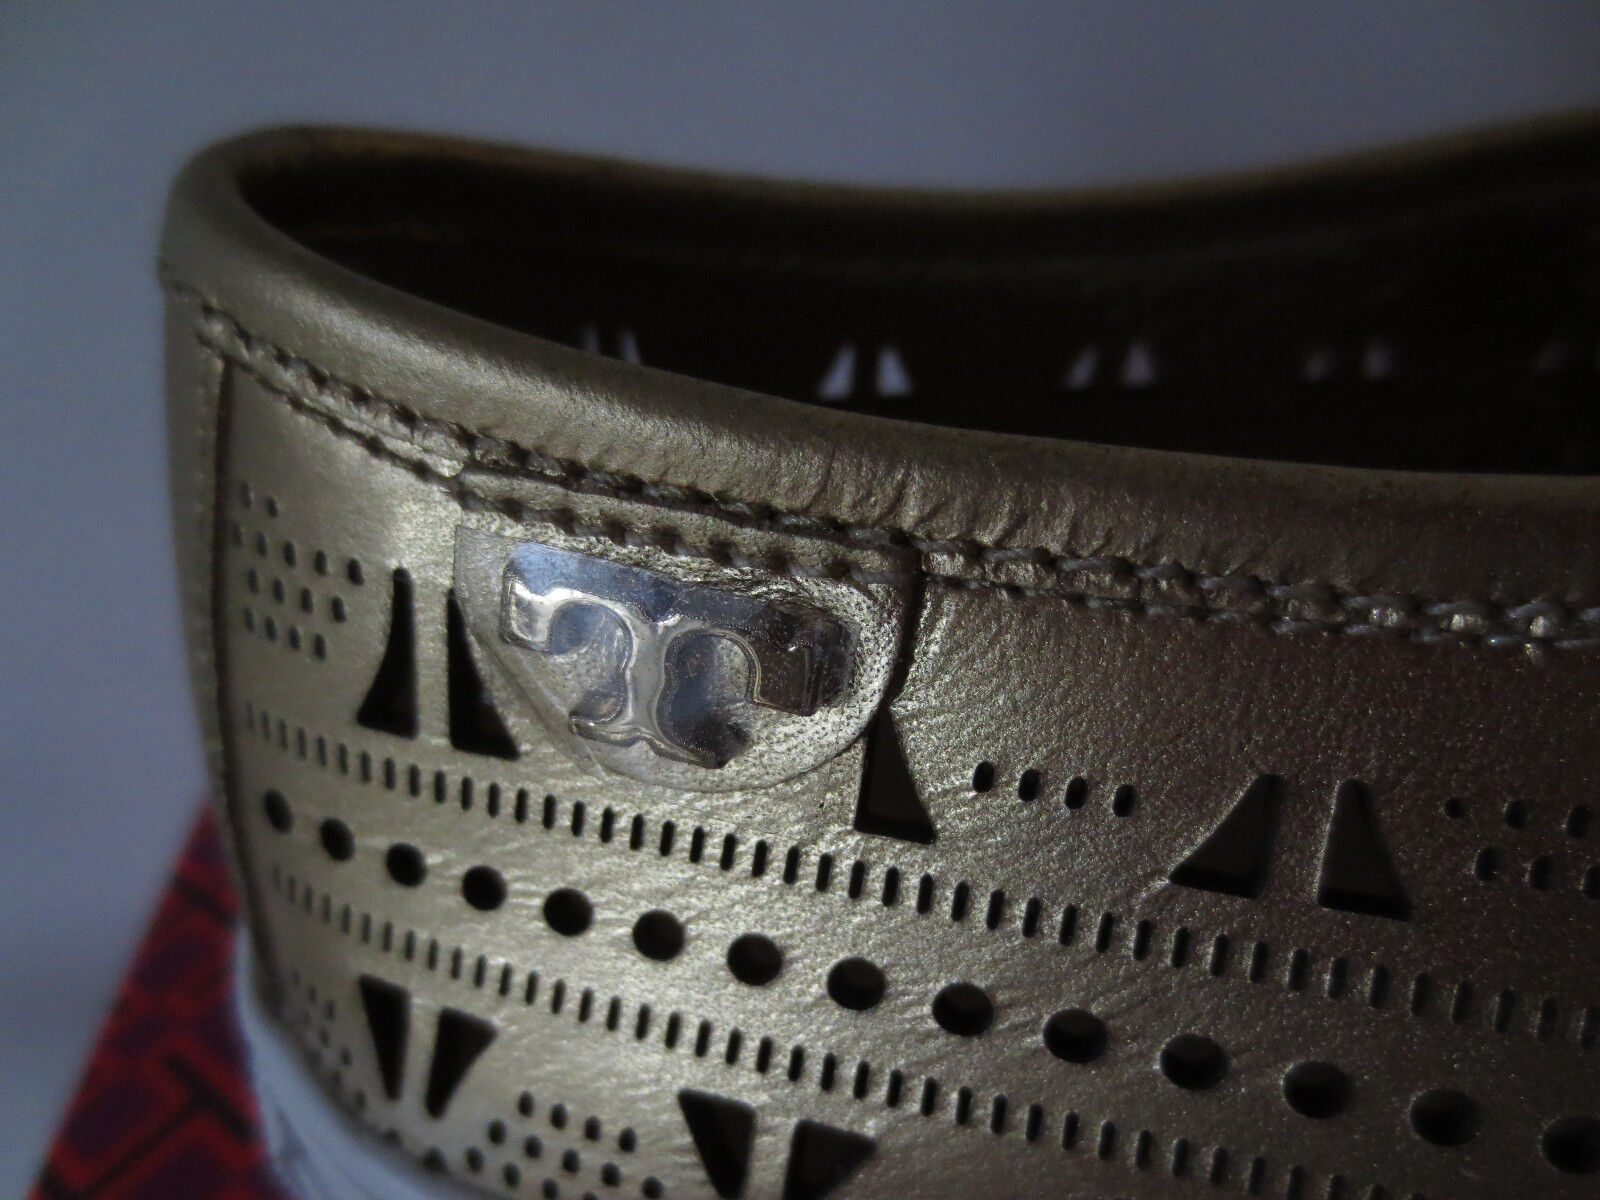 TORY BURCH Sneakers Metallic Bronze Metallic Sneakers Gr.41 10 Leder Schuhe Sneaker 12168241 bf0b48